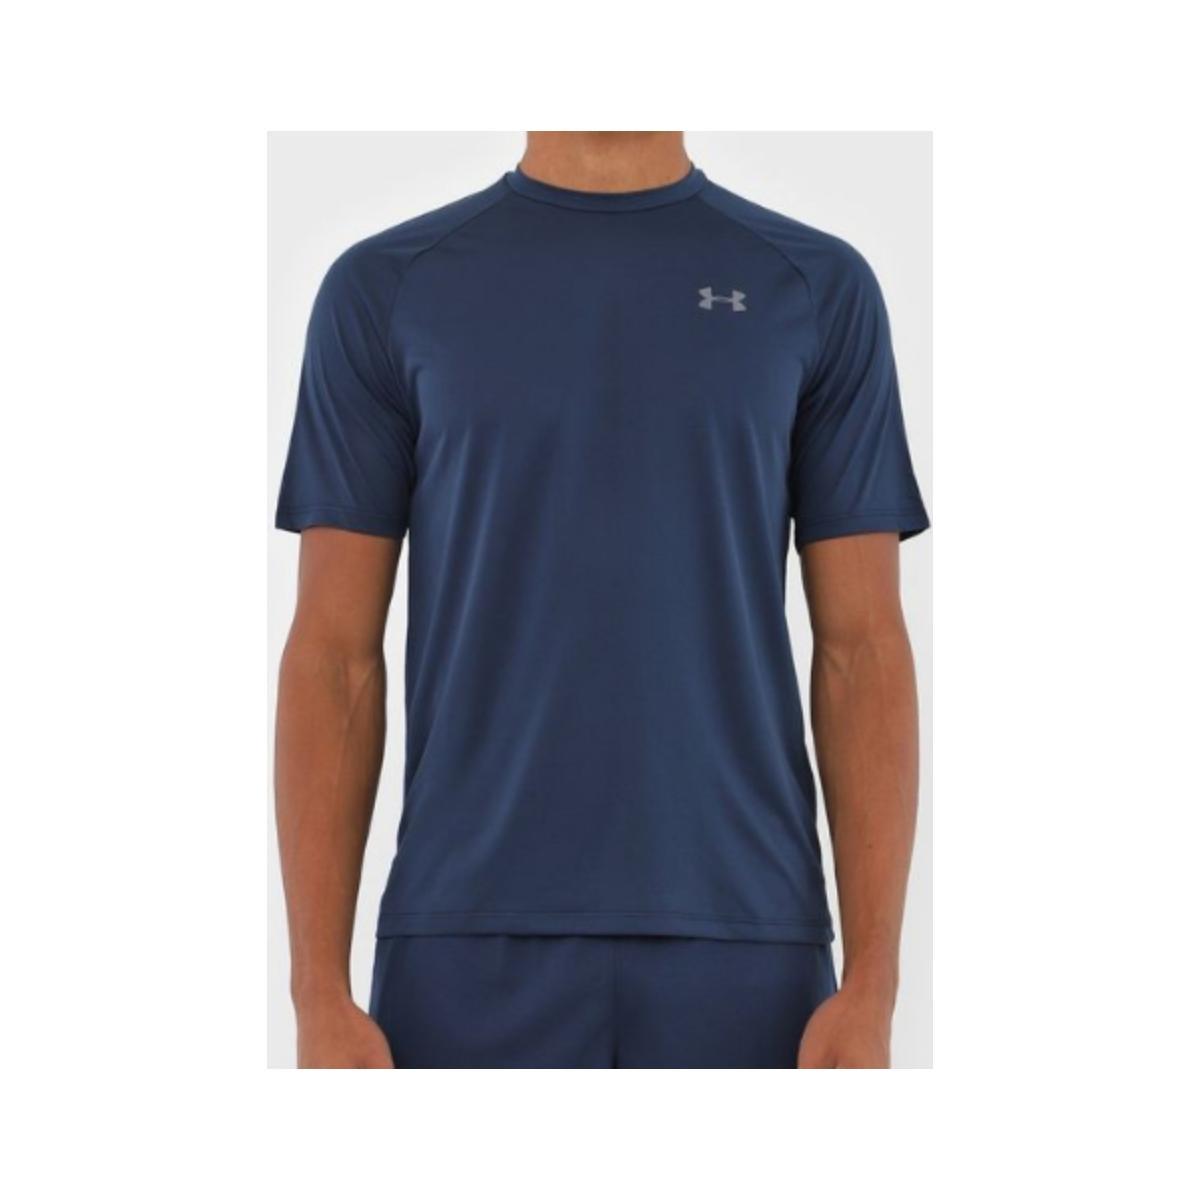 Camiseta Masculina Under Armour 1359378 Tech 2.0 Marinho